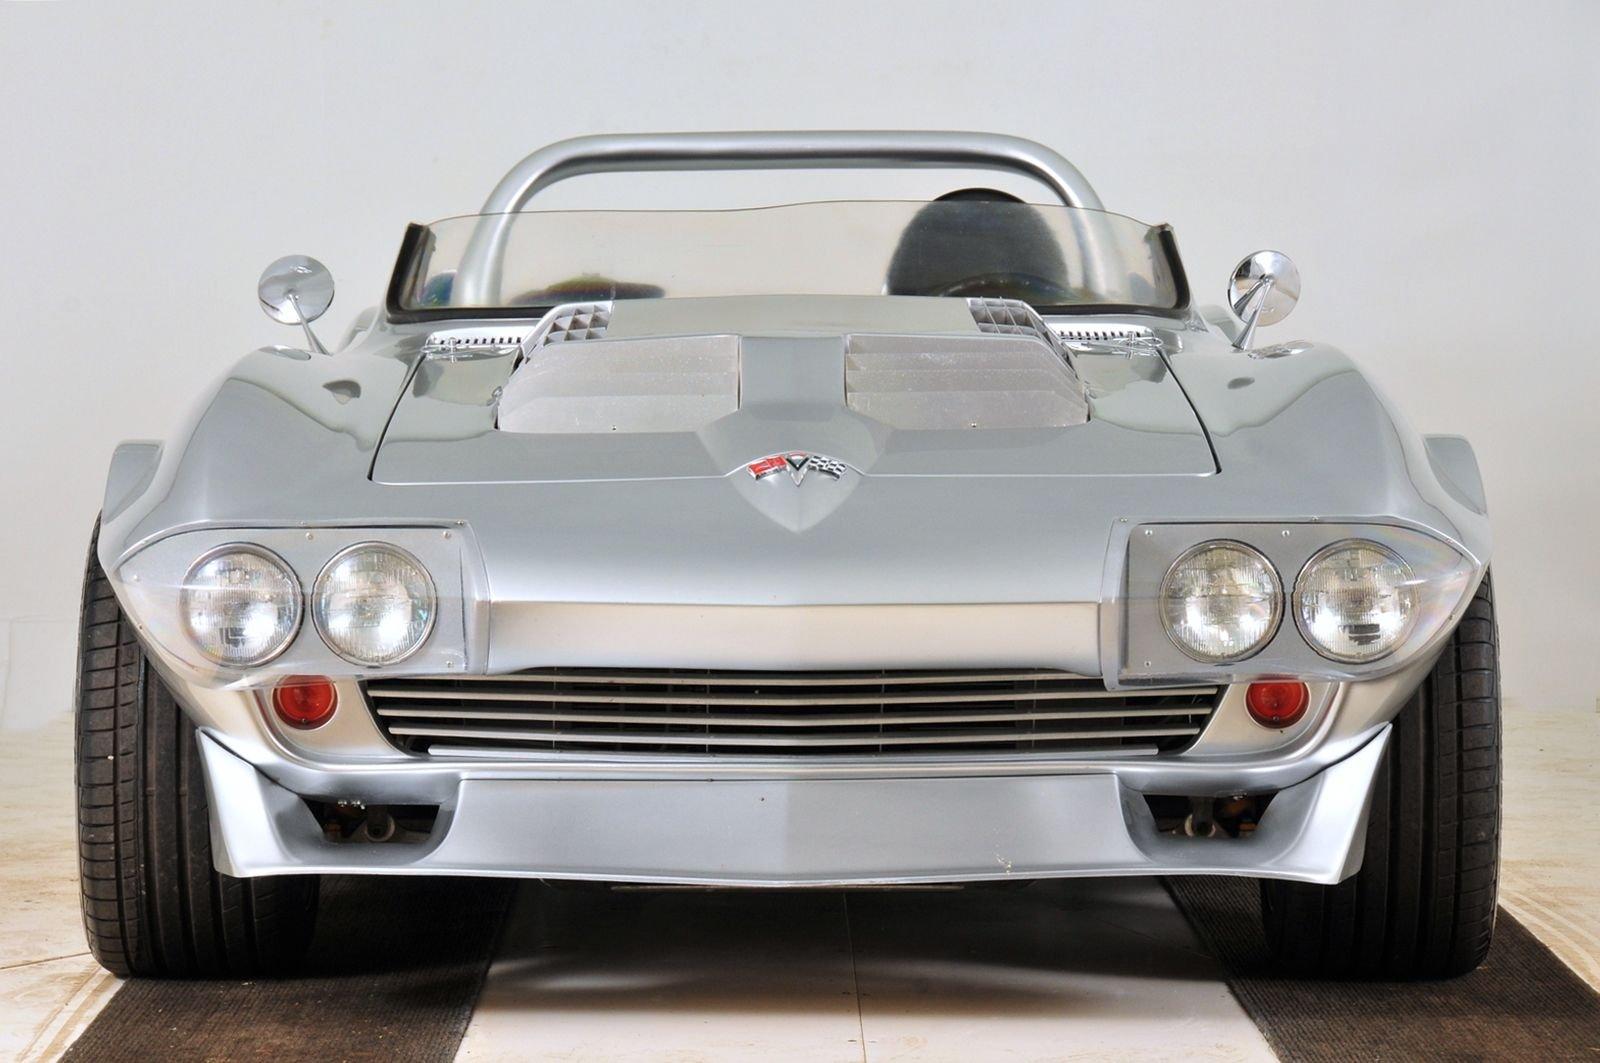 1963 Chevrolet Corvette Mongoose Motorsports Grand Sport Fast Five front